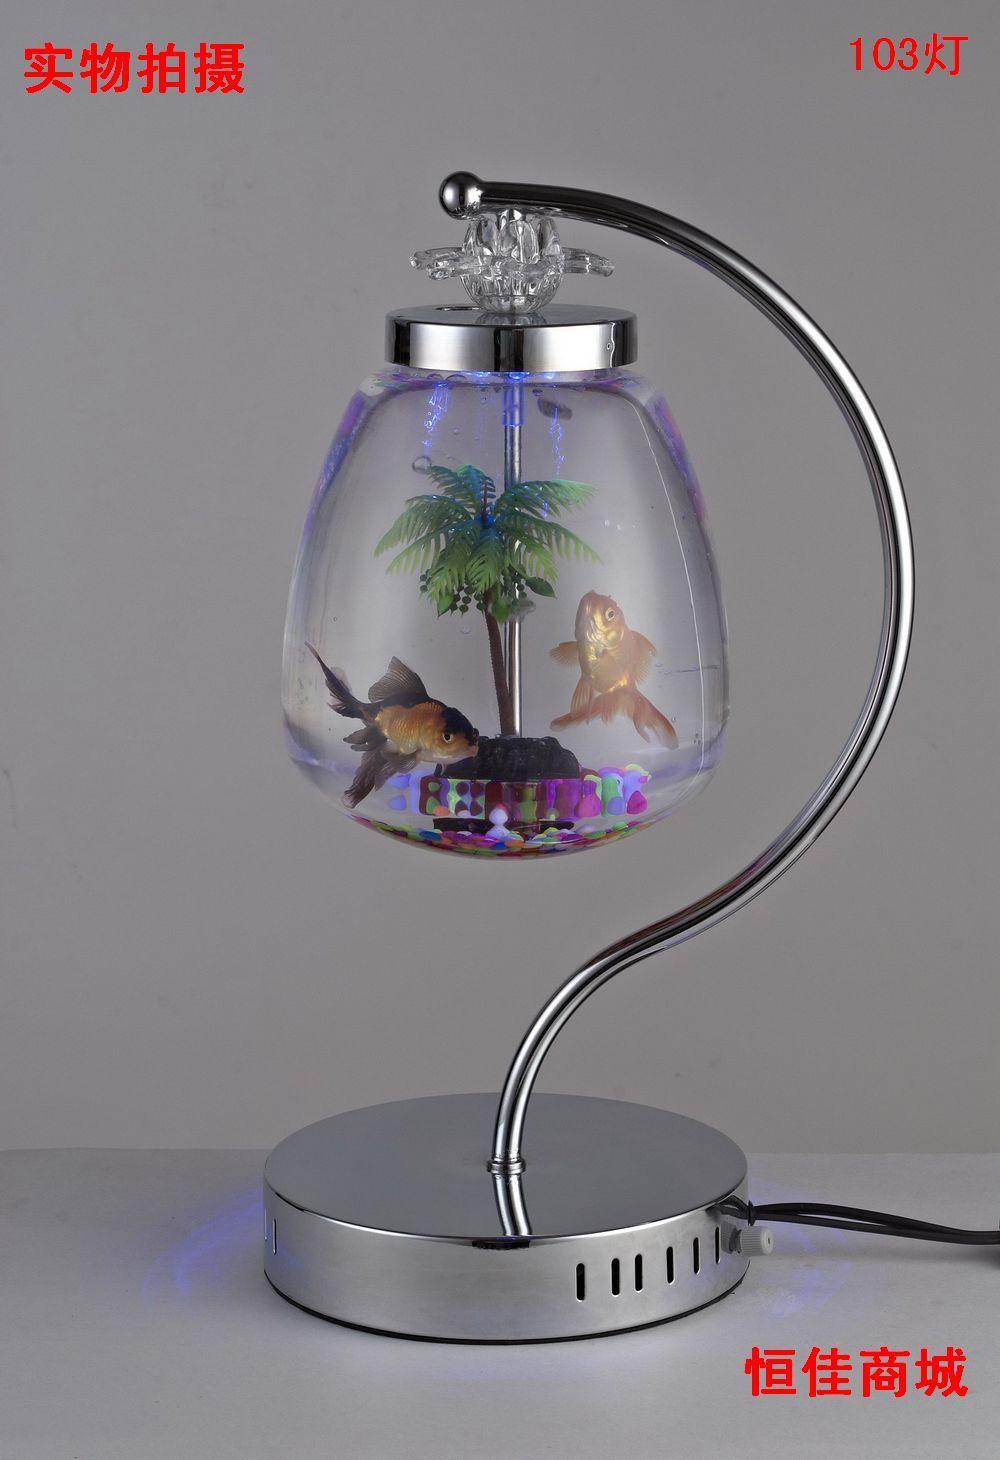 Tanks Fish Tanks And Aquarium On Pinterest